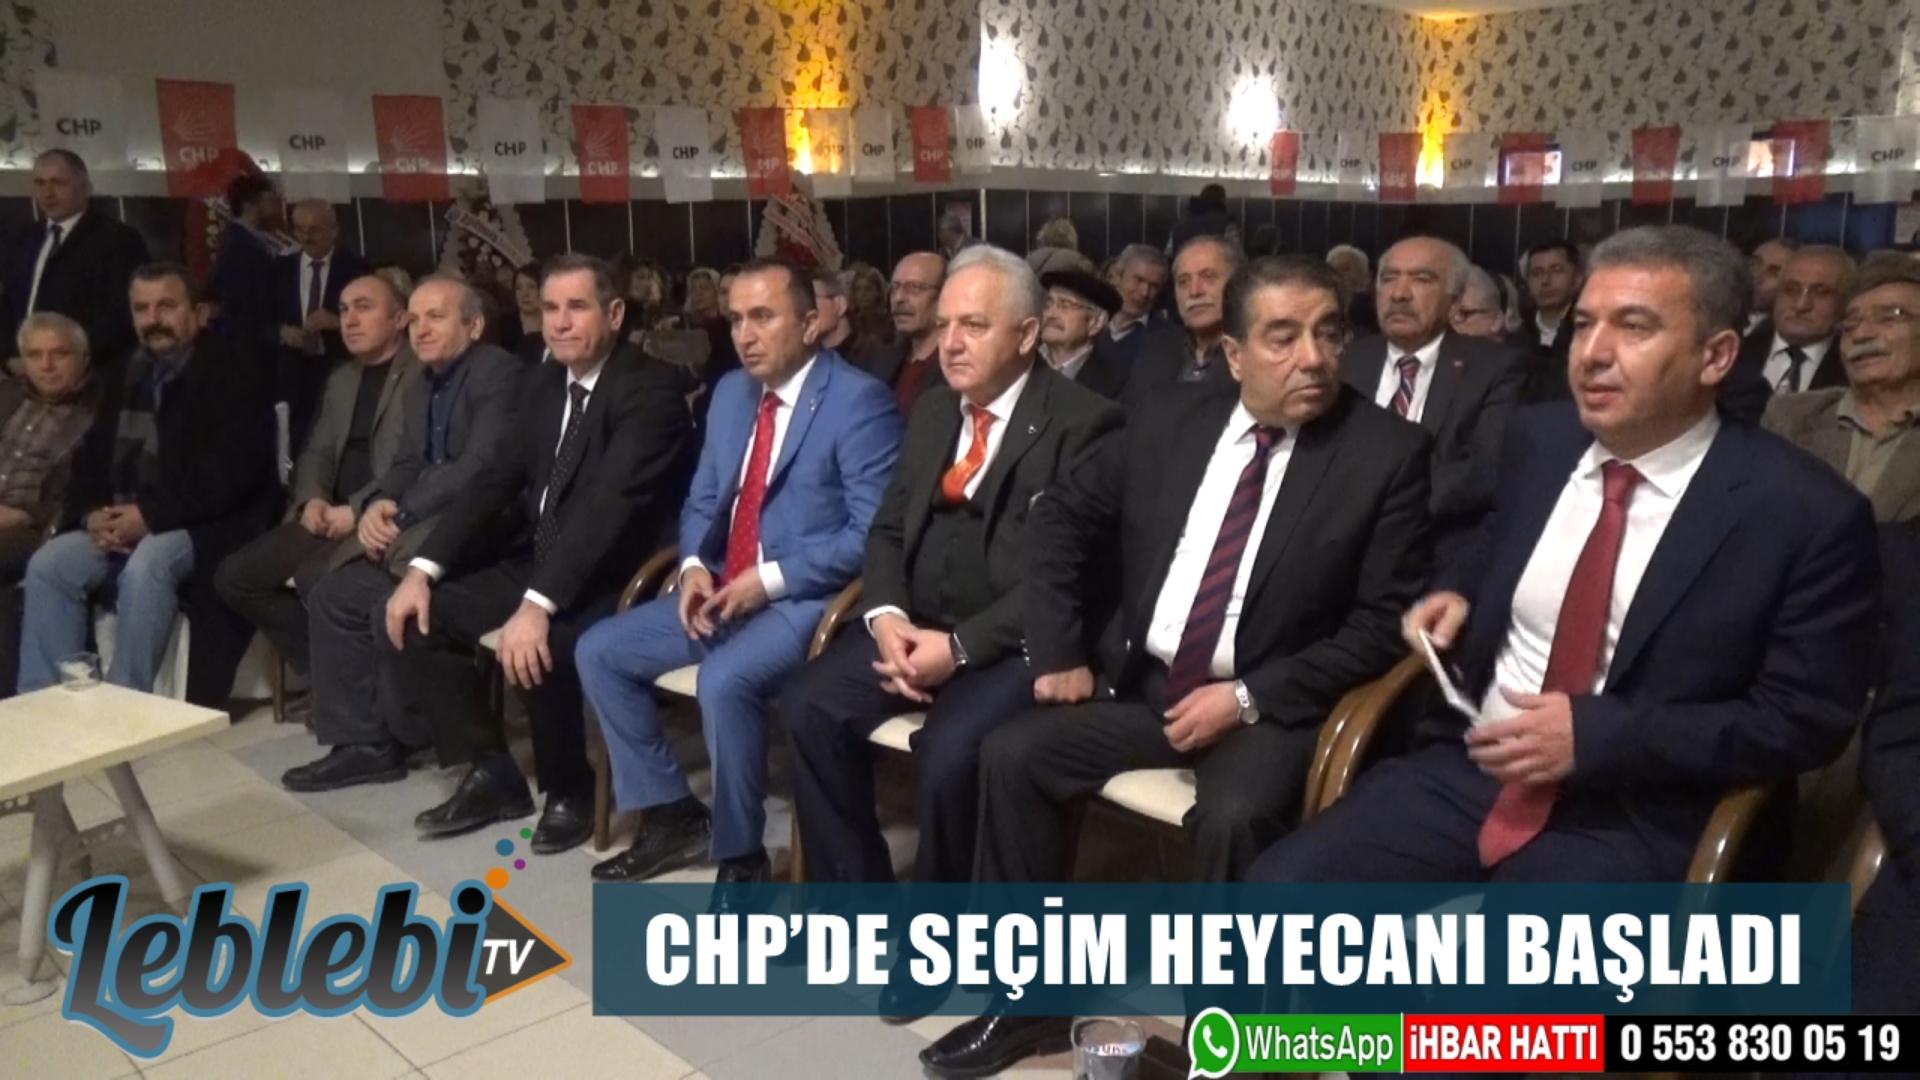 CHP'DE SEÇİM HEYECANI BAŞLADI